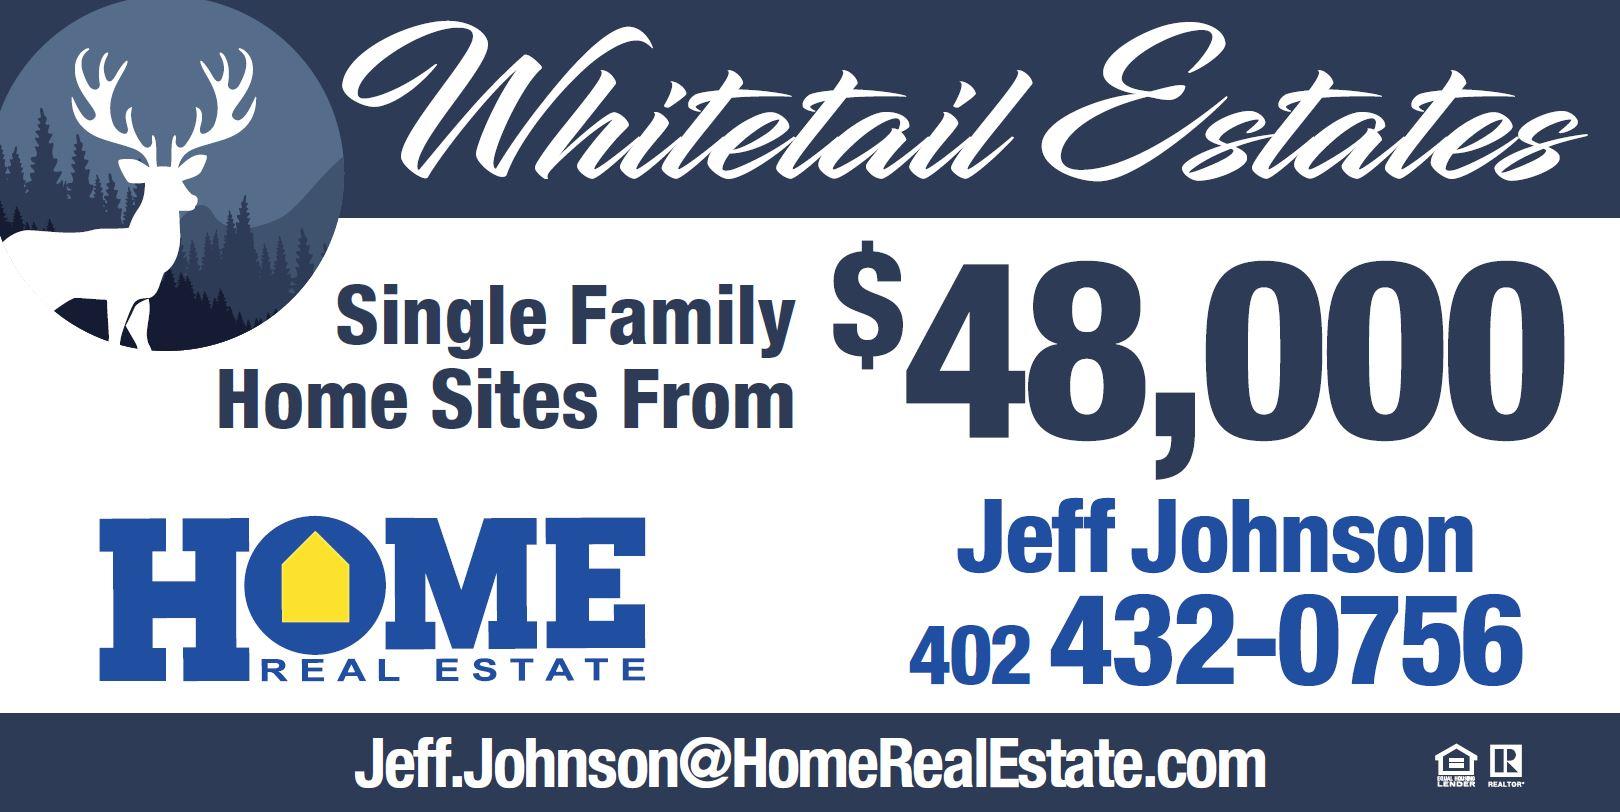 Whitetail Estates | Single Family Home Sites From $48,00